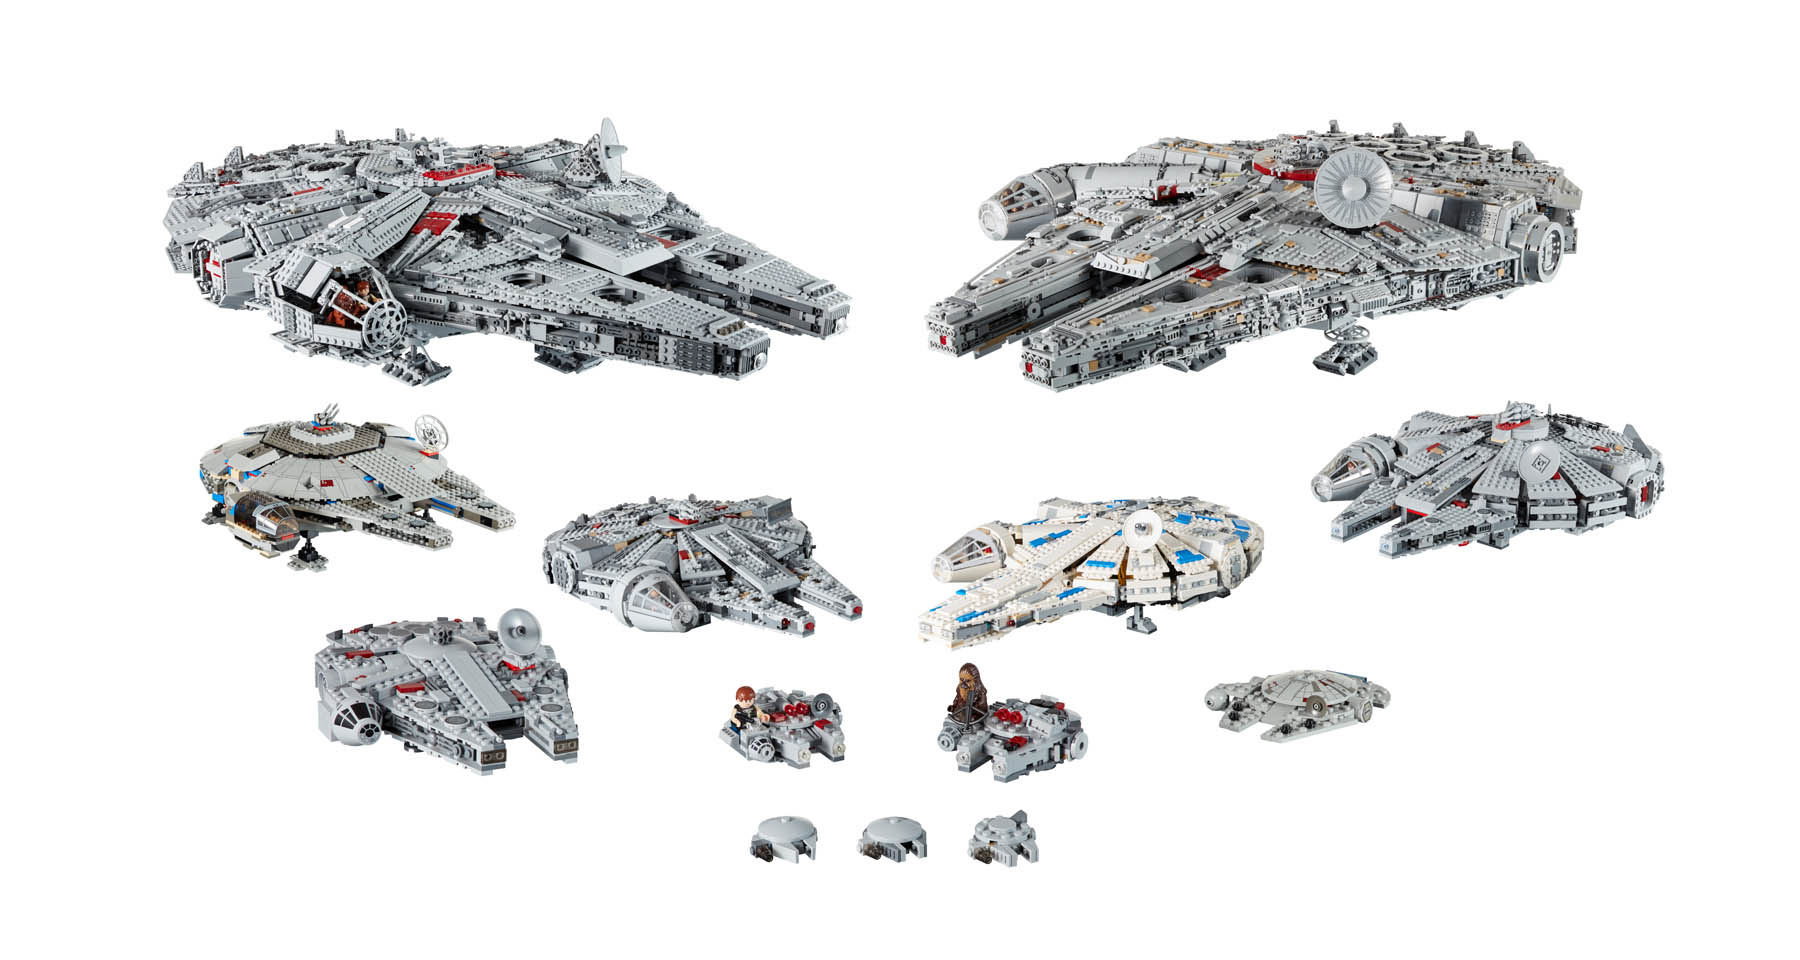 LEGO Star Wars 20th Anniversary Metallic Logo